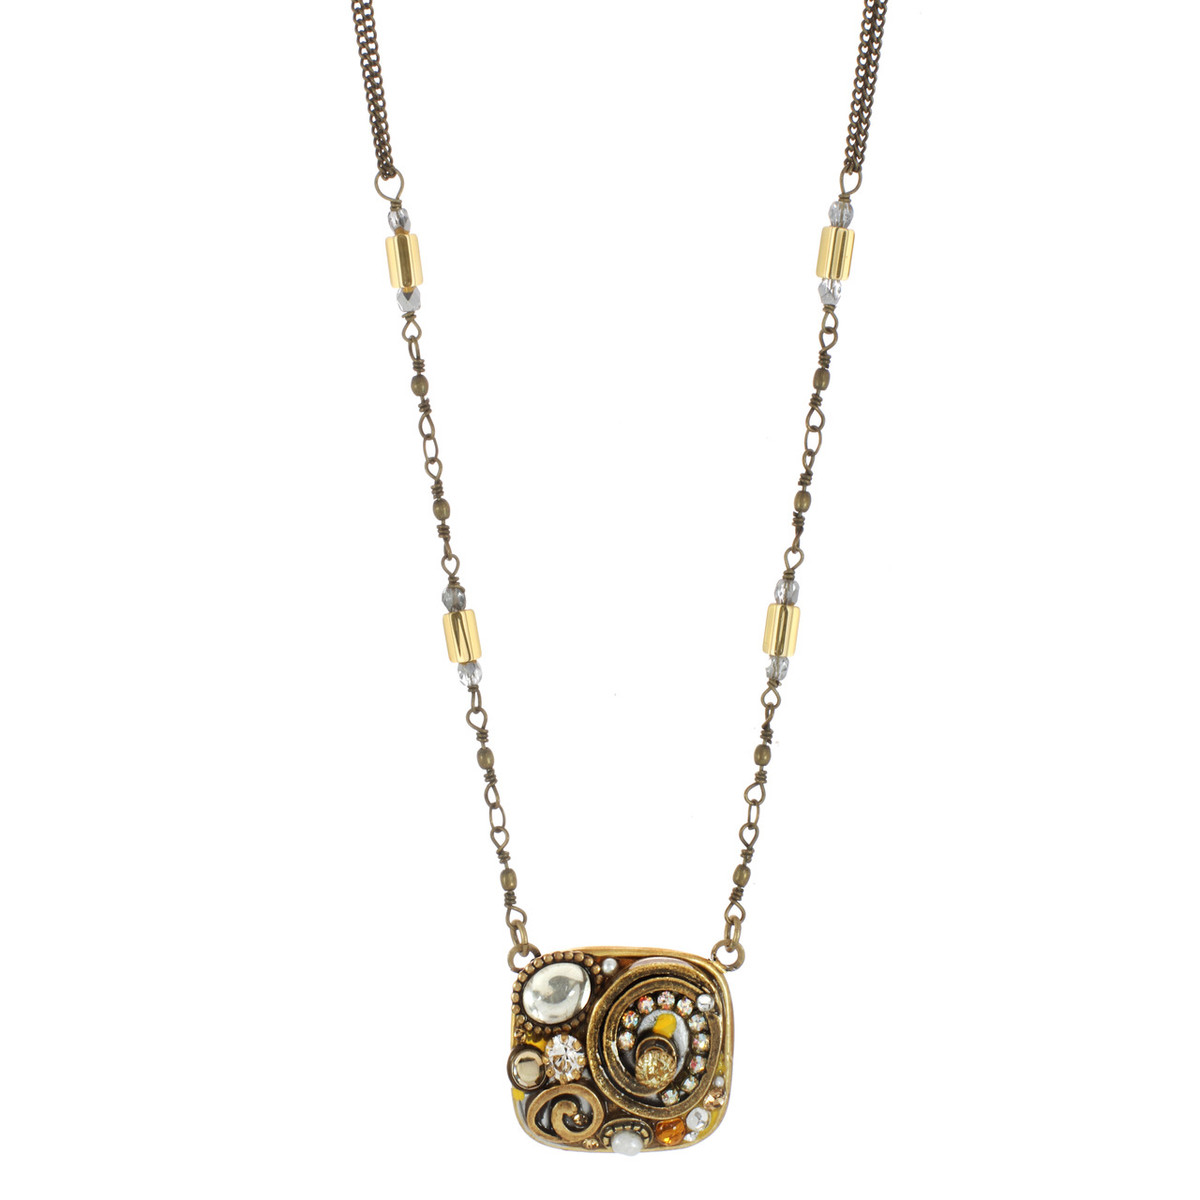 Orange Michal Golan Jewelry Medium Square Necklace